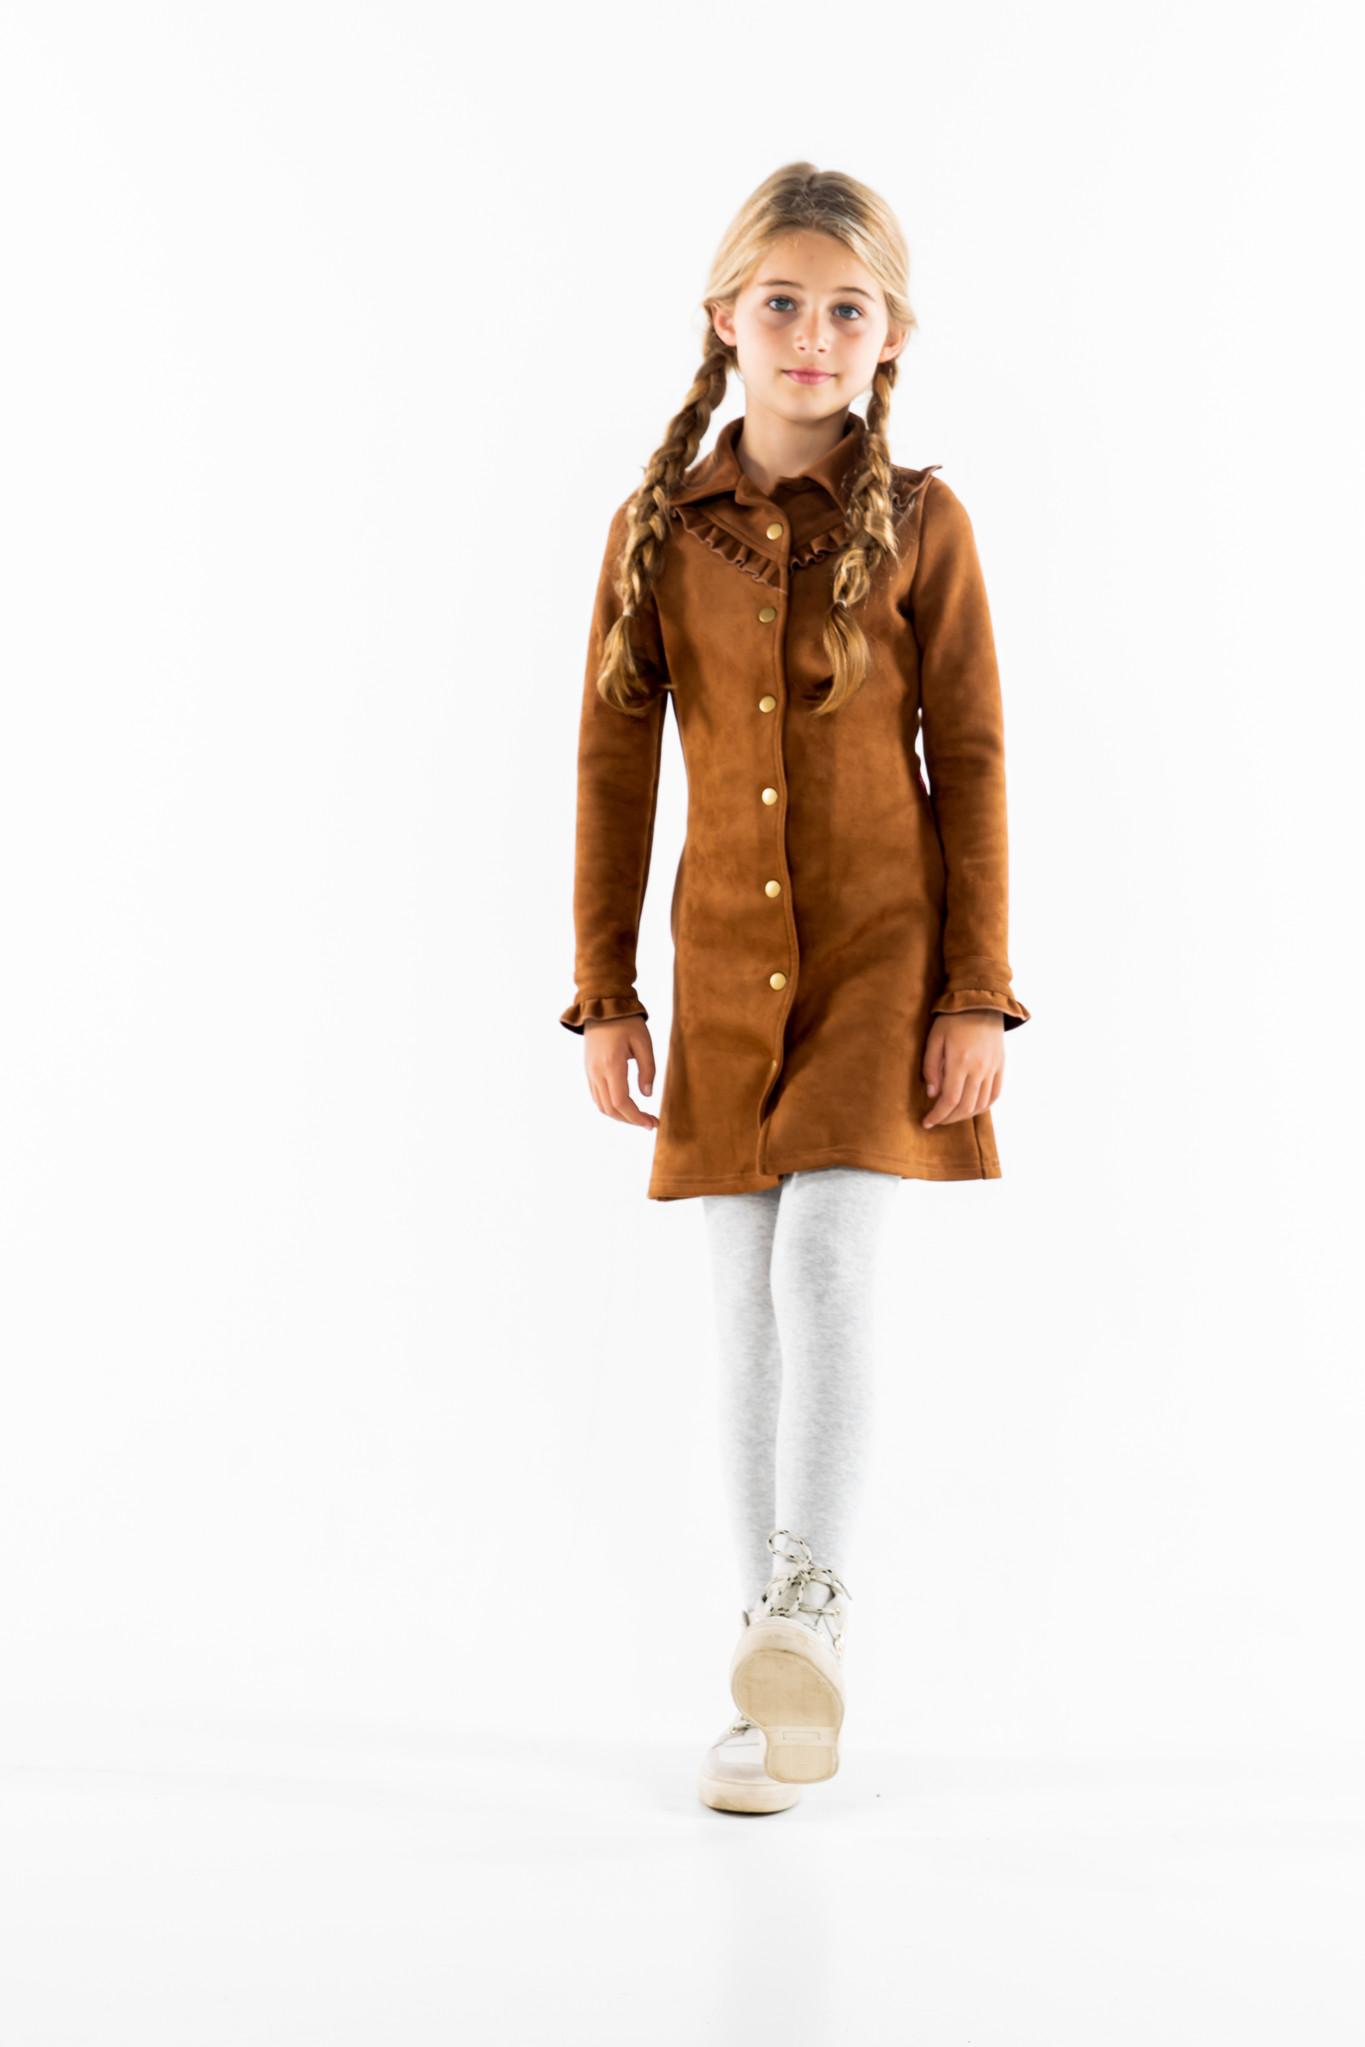 Mayce Girlslabel lookbook winter 2022-78